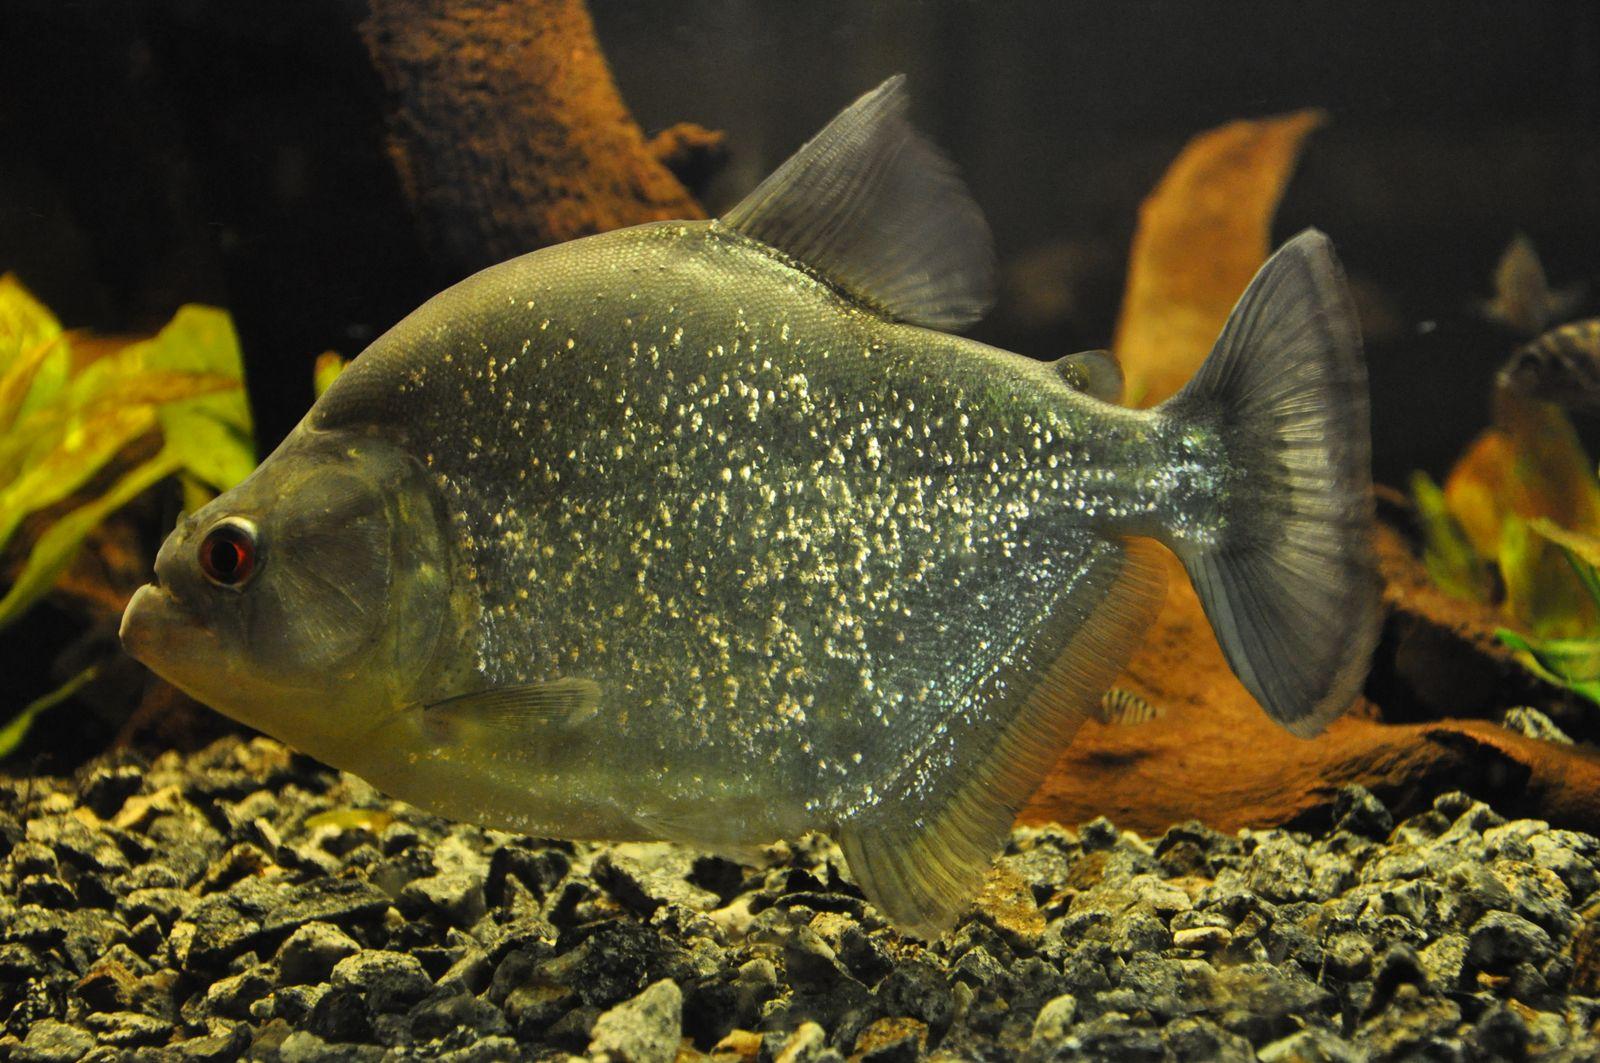 Black Piranha / Serrasalmus rhombeus 38 cm - YouTube